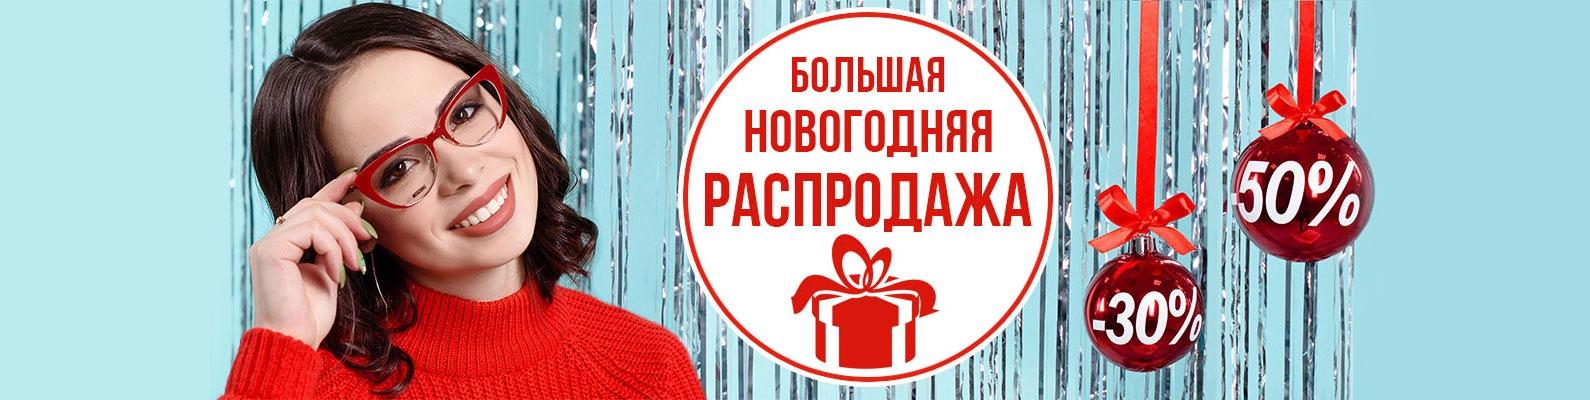 ebf3698e4fa3 Оптика в Самаре Доктор Линз   ВКонтакте